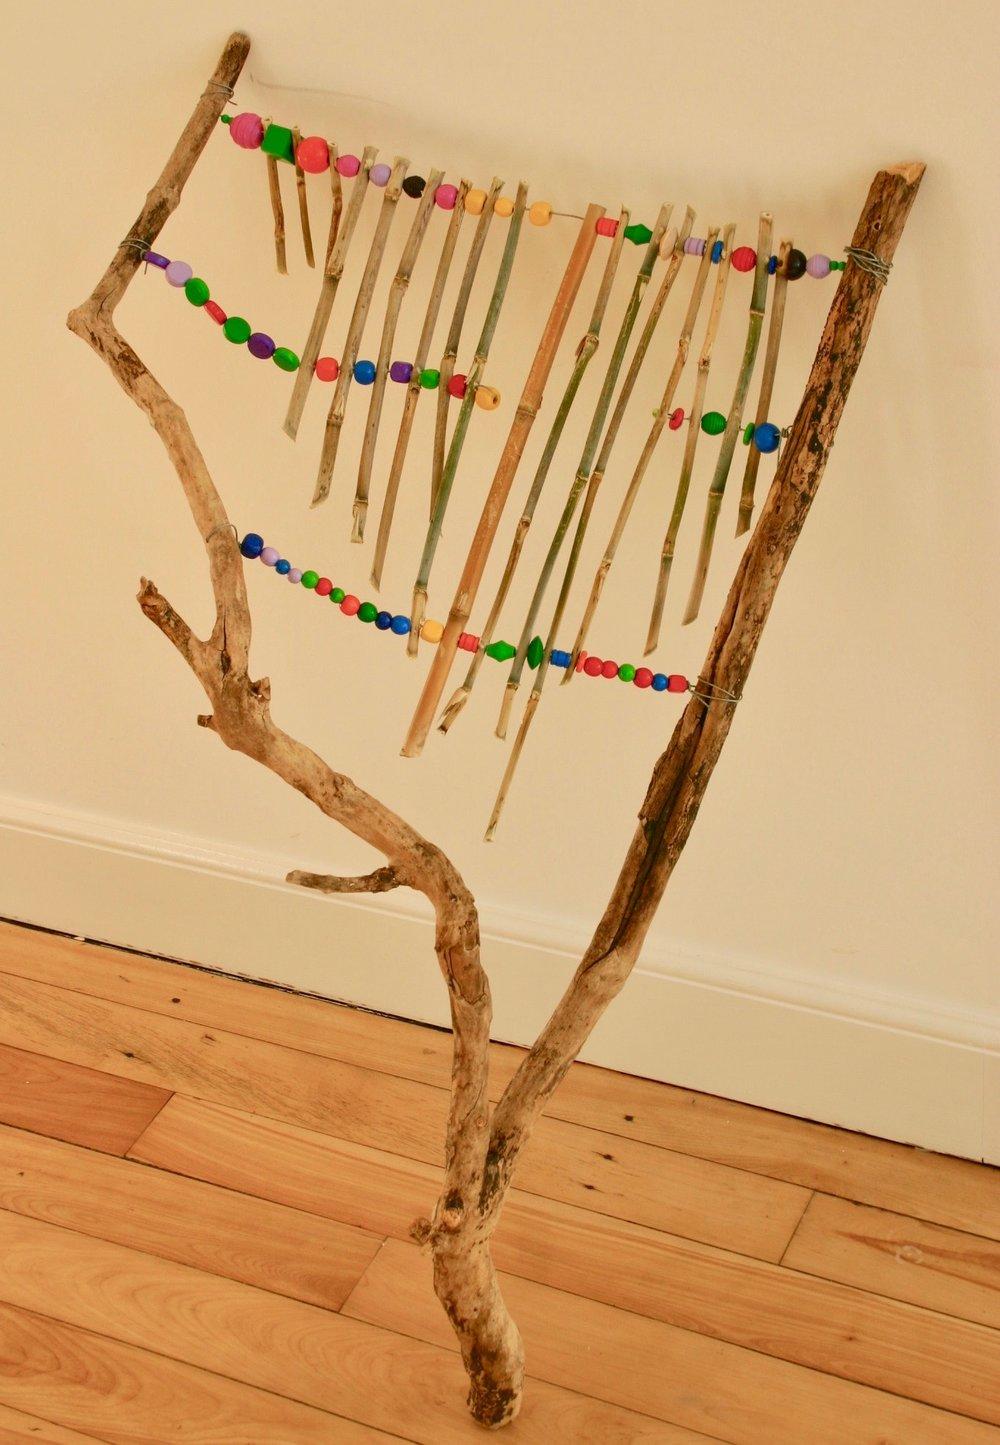 3-musical-instruments-environmental-art-artist-craigmillar-castle.jpg